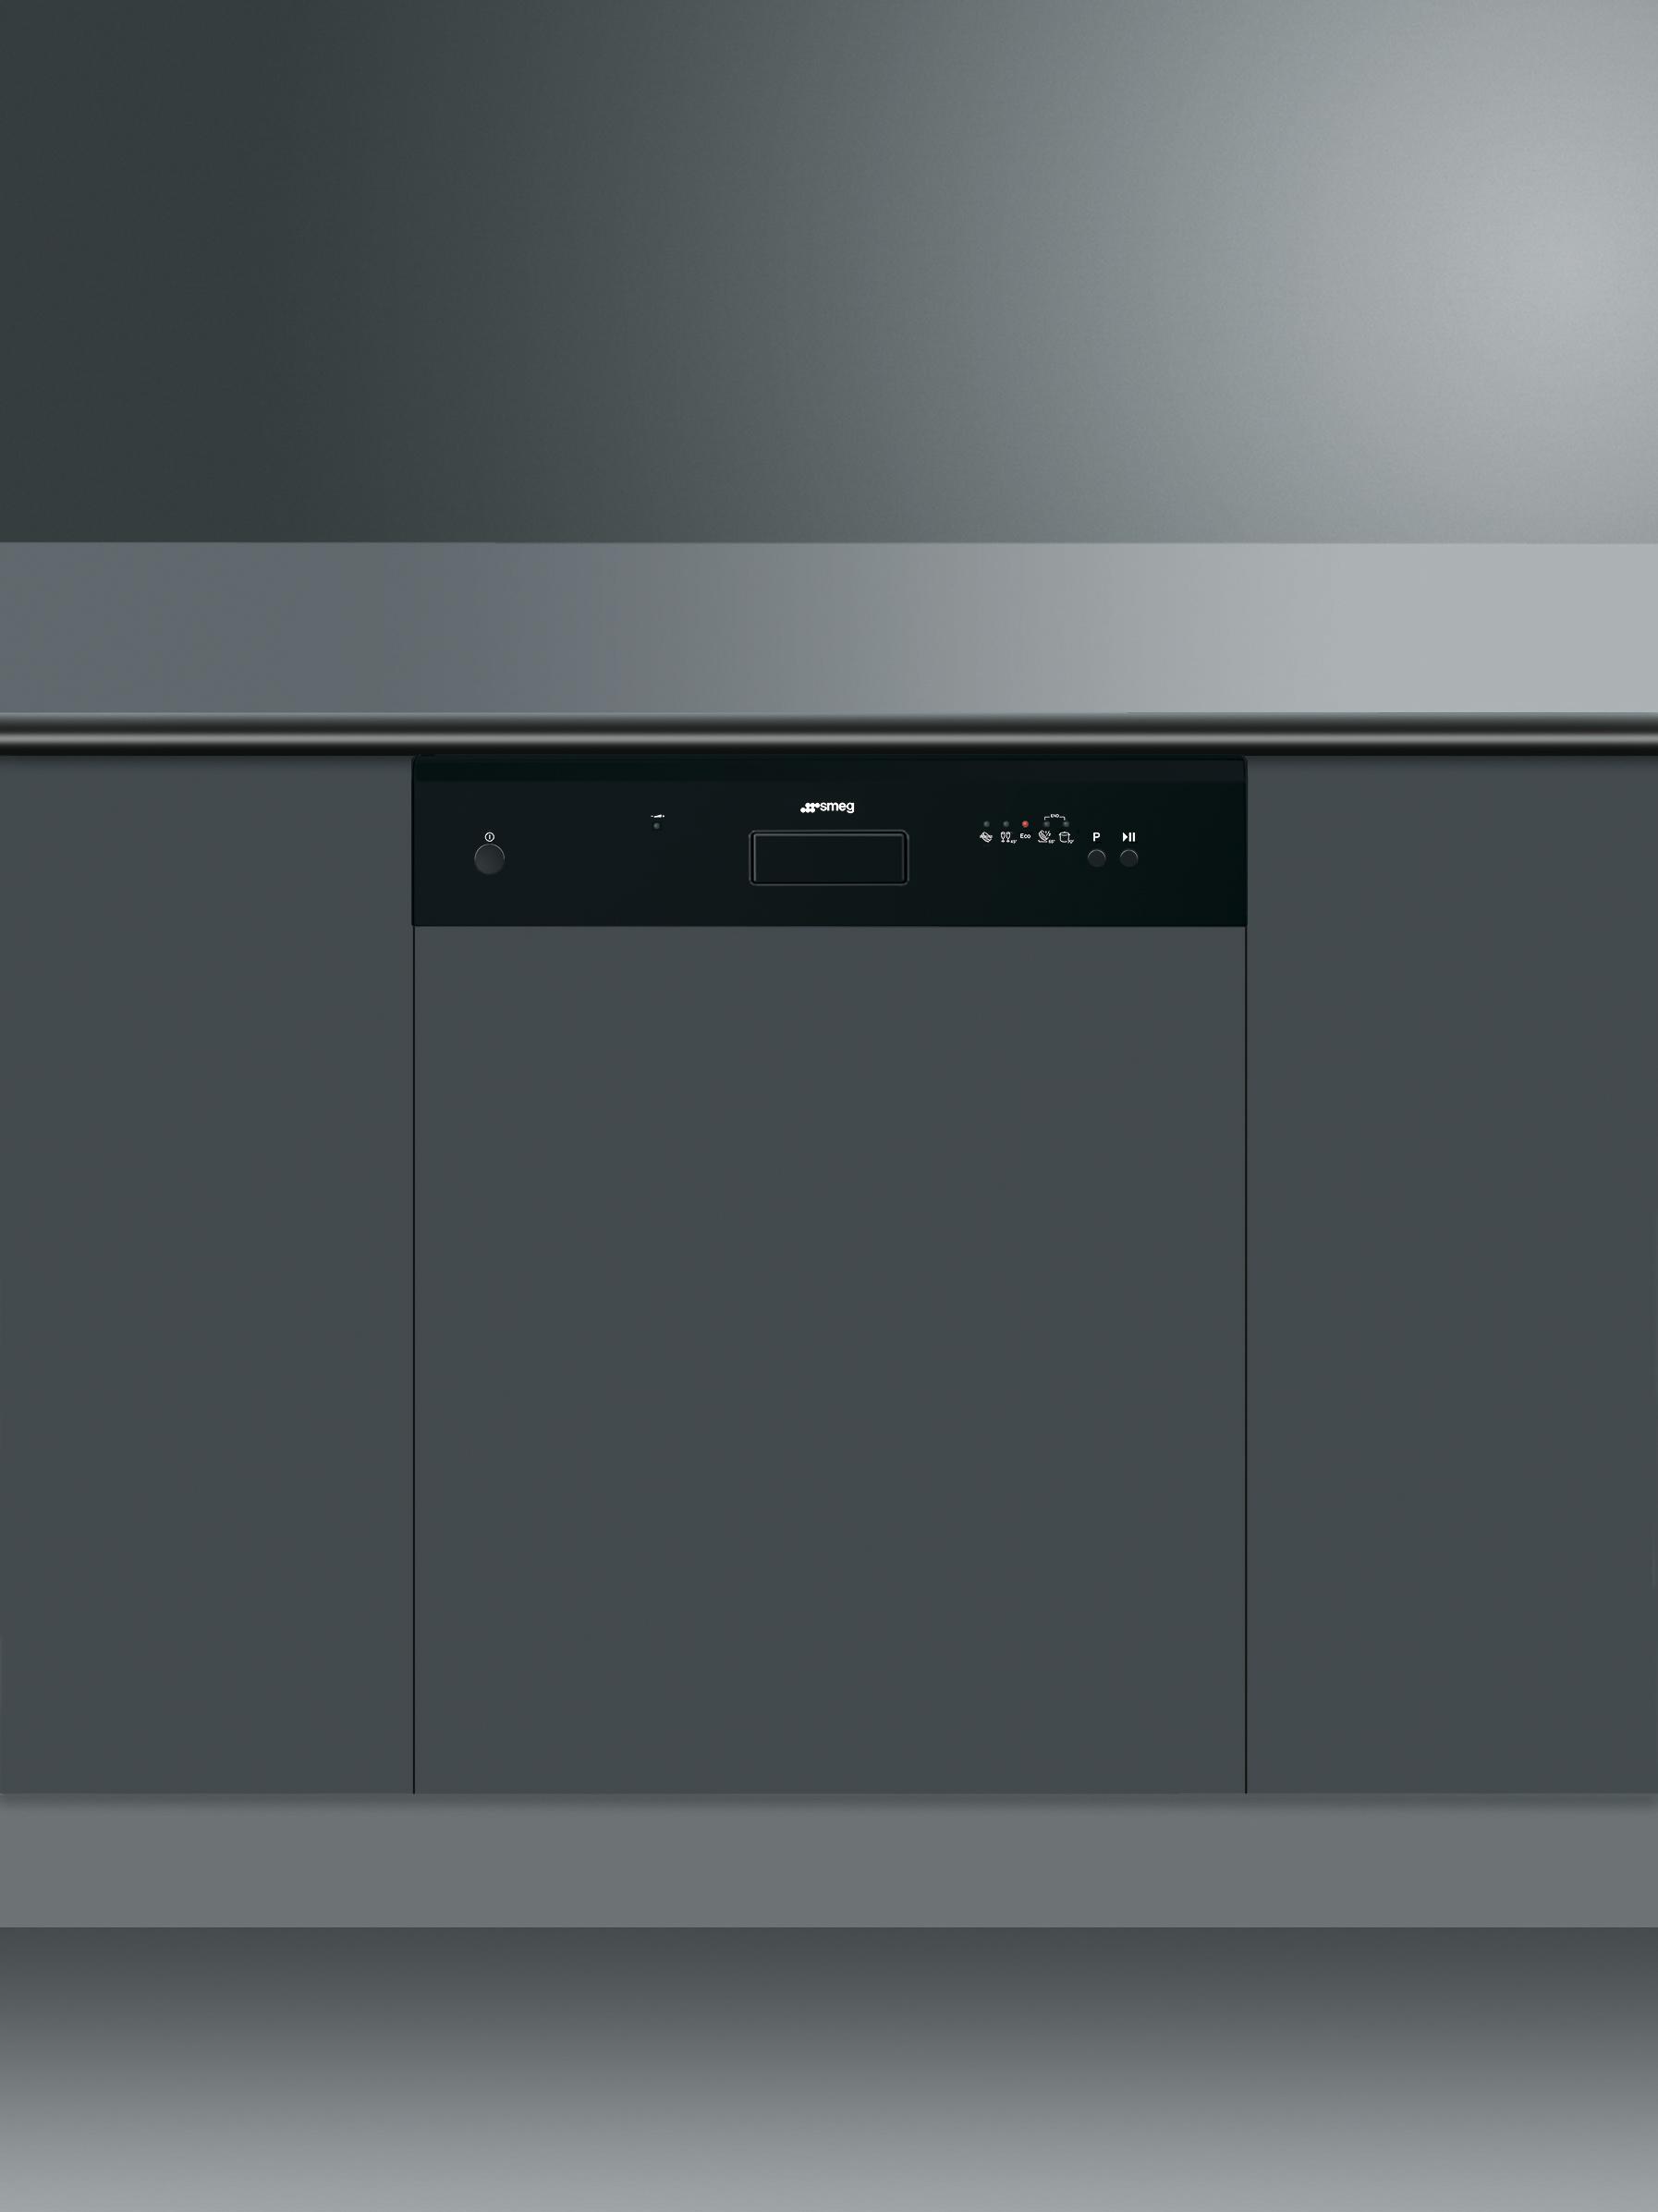 Smeg PL521N Integrabile 12coperti A+ lavastoviglie 8017709180966 PL521N 08_PL521N